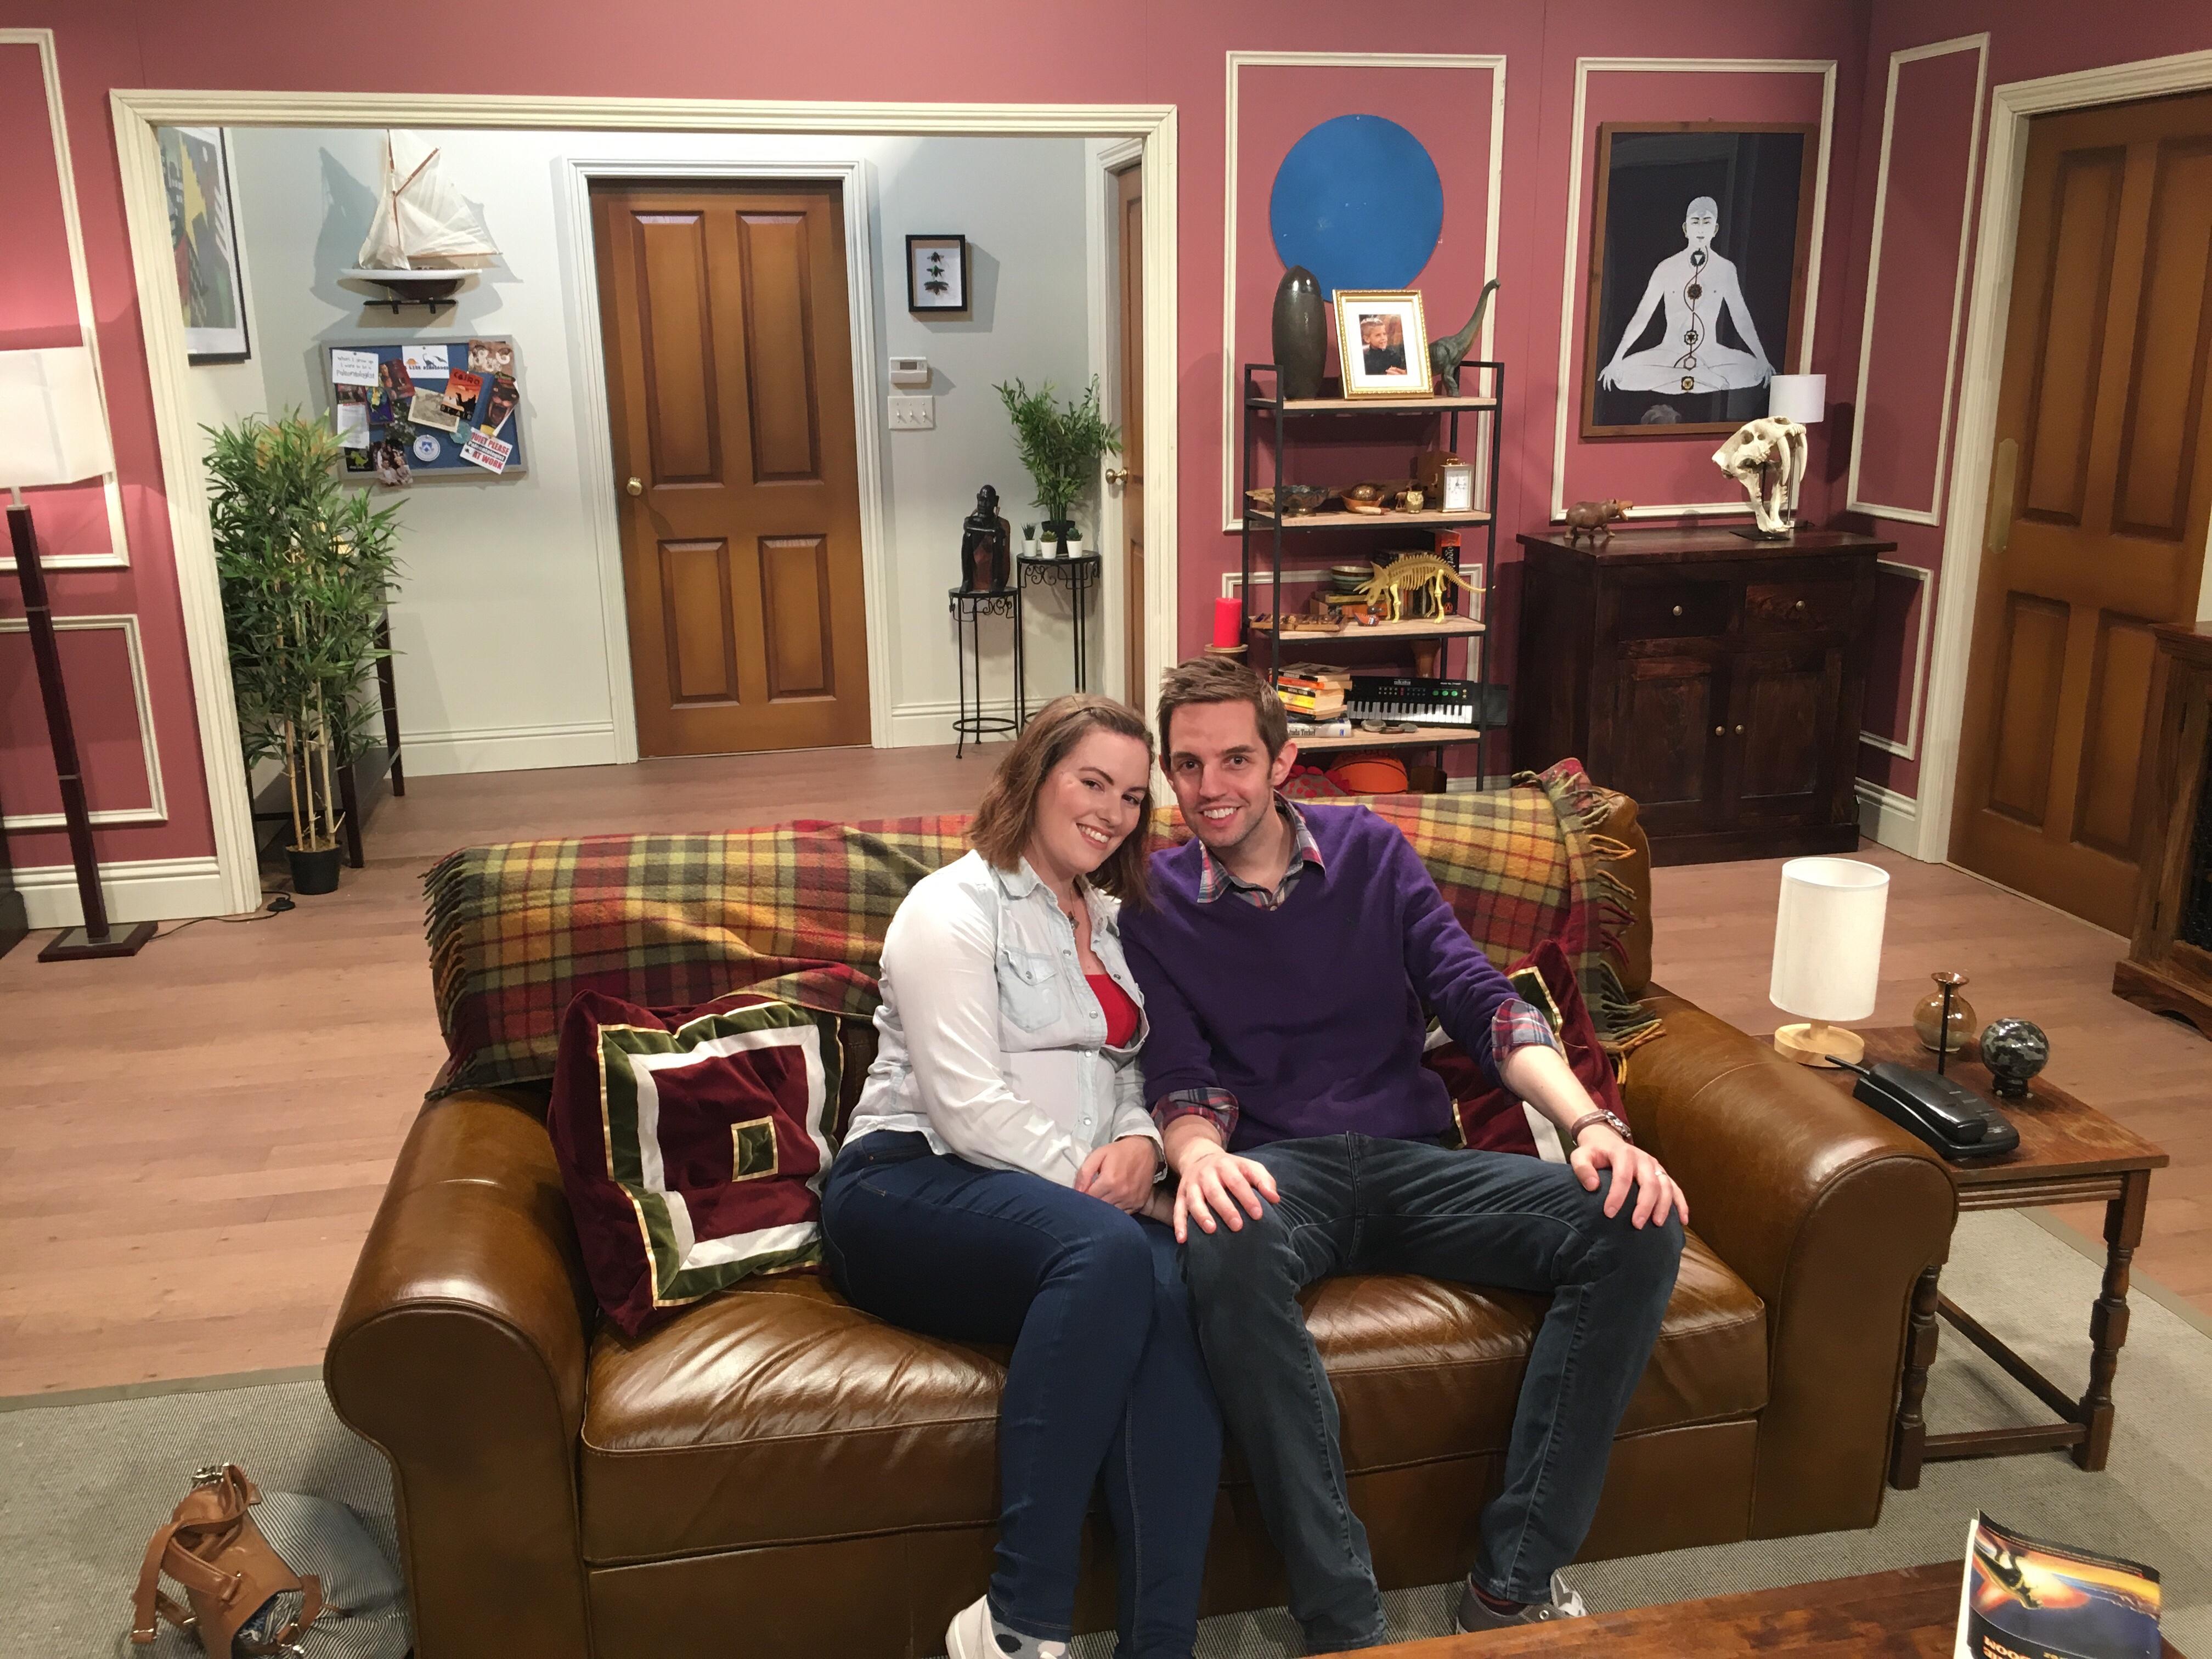 Sitting on Ross's sofa